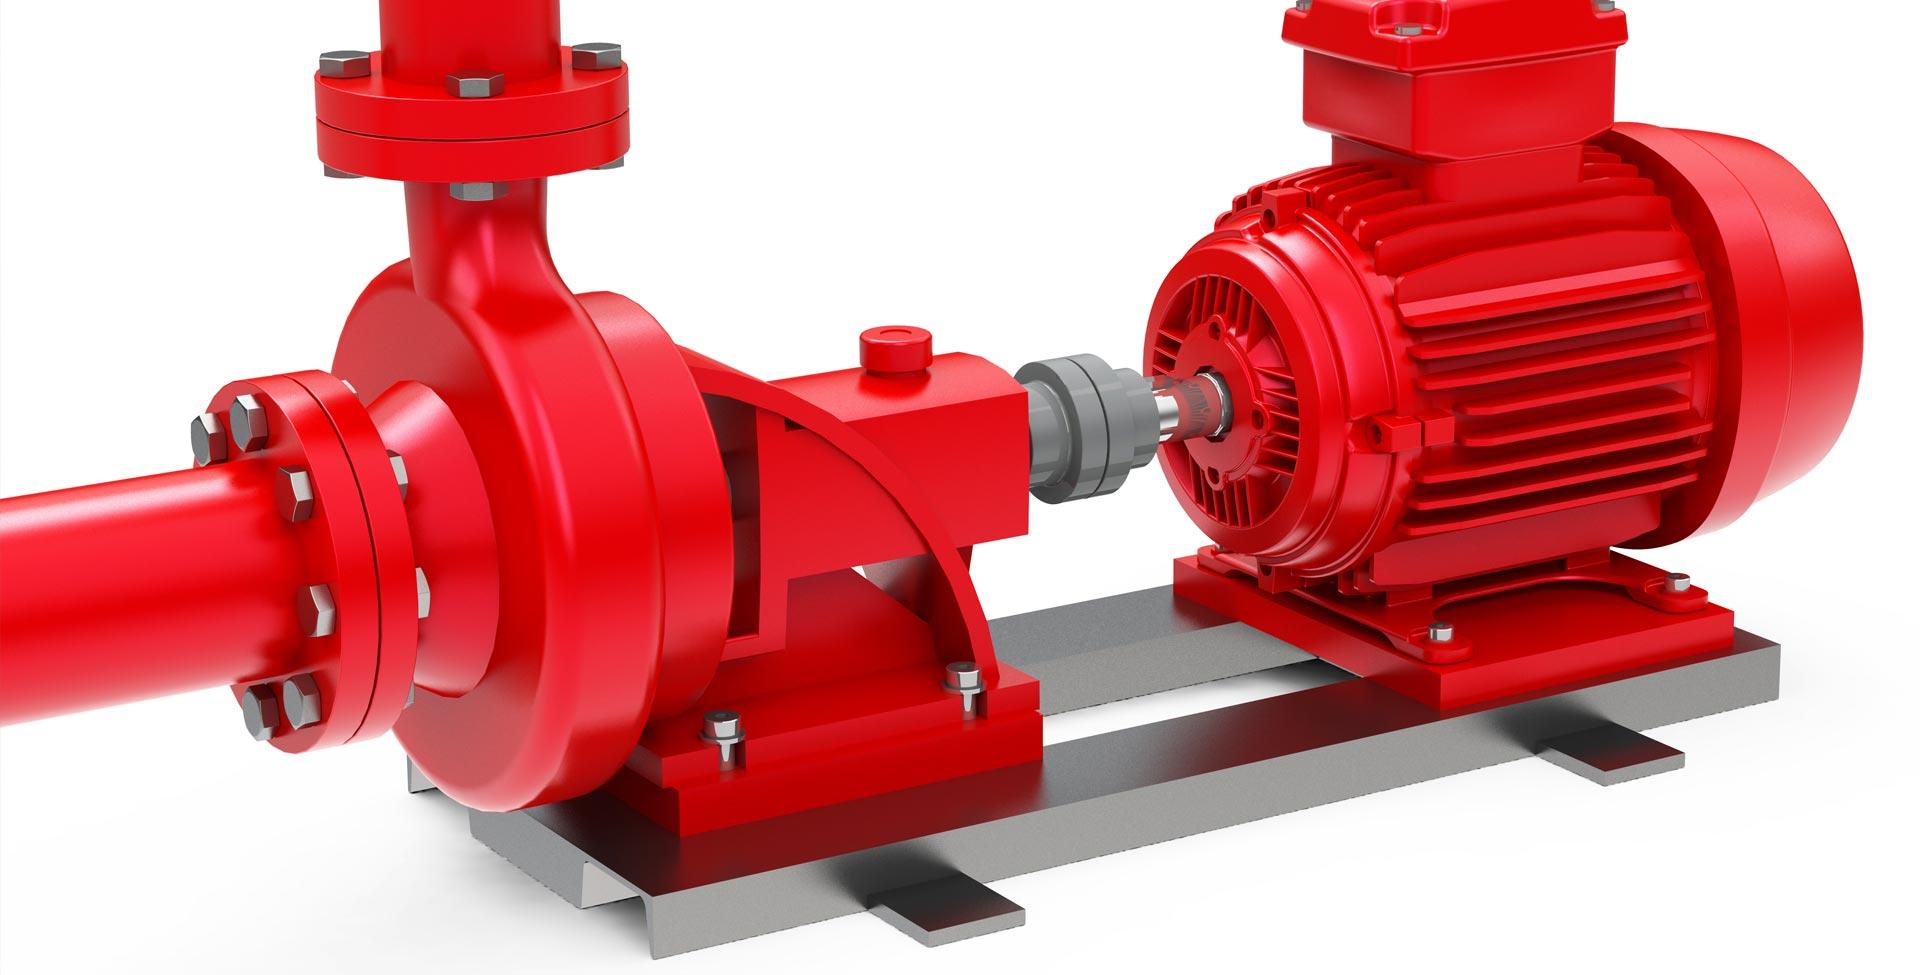 Fire Pumps & Tanks | Strategic Fire Solutions | Brisbane Fire Protection